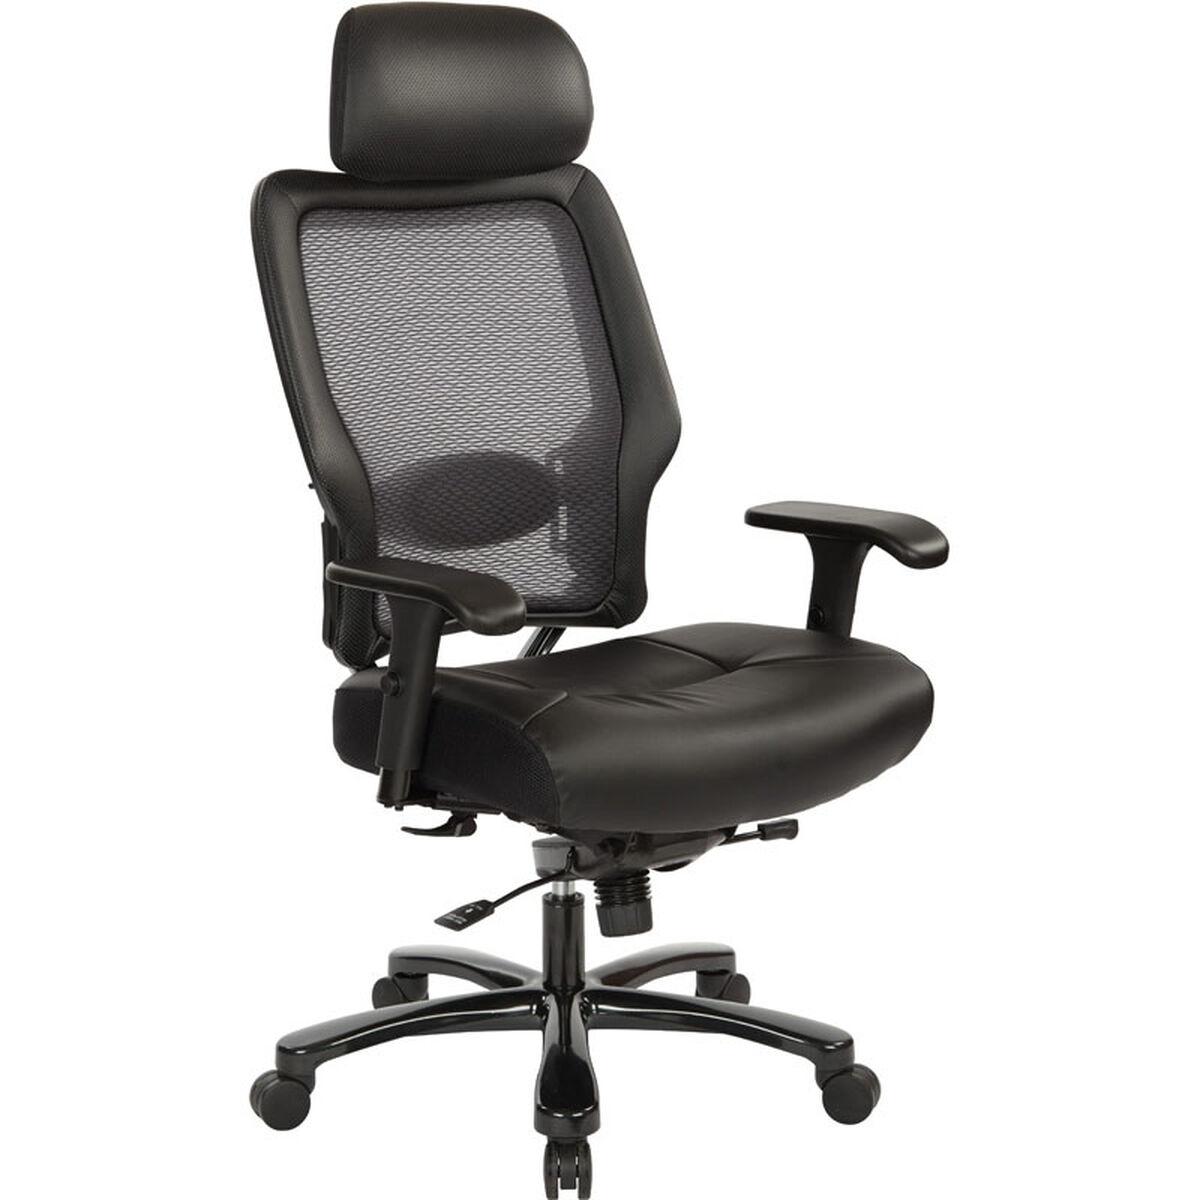 Space Big and Tall Office Chair 63-E37A773HL | Bizchair.com